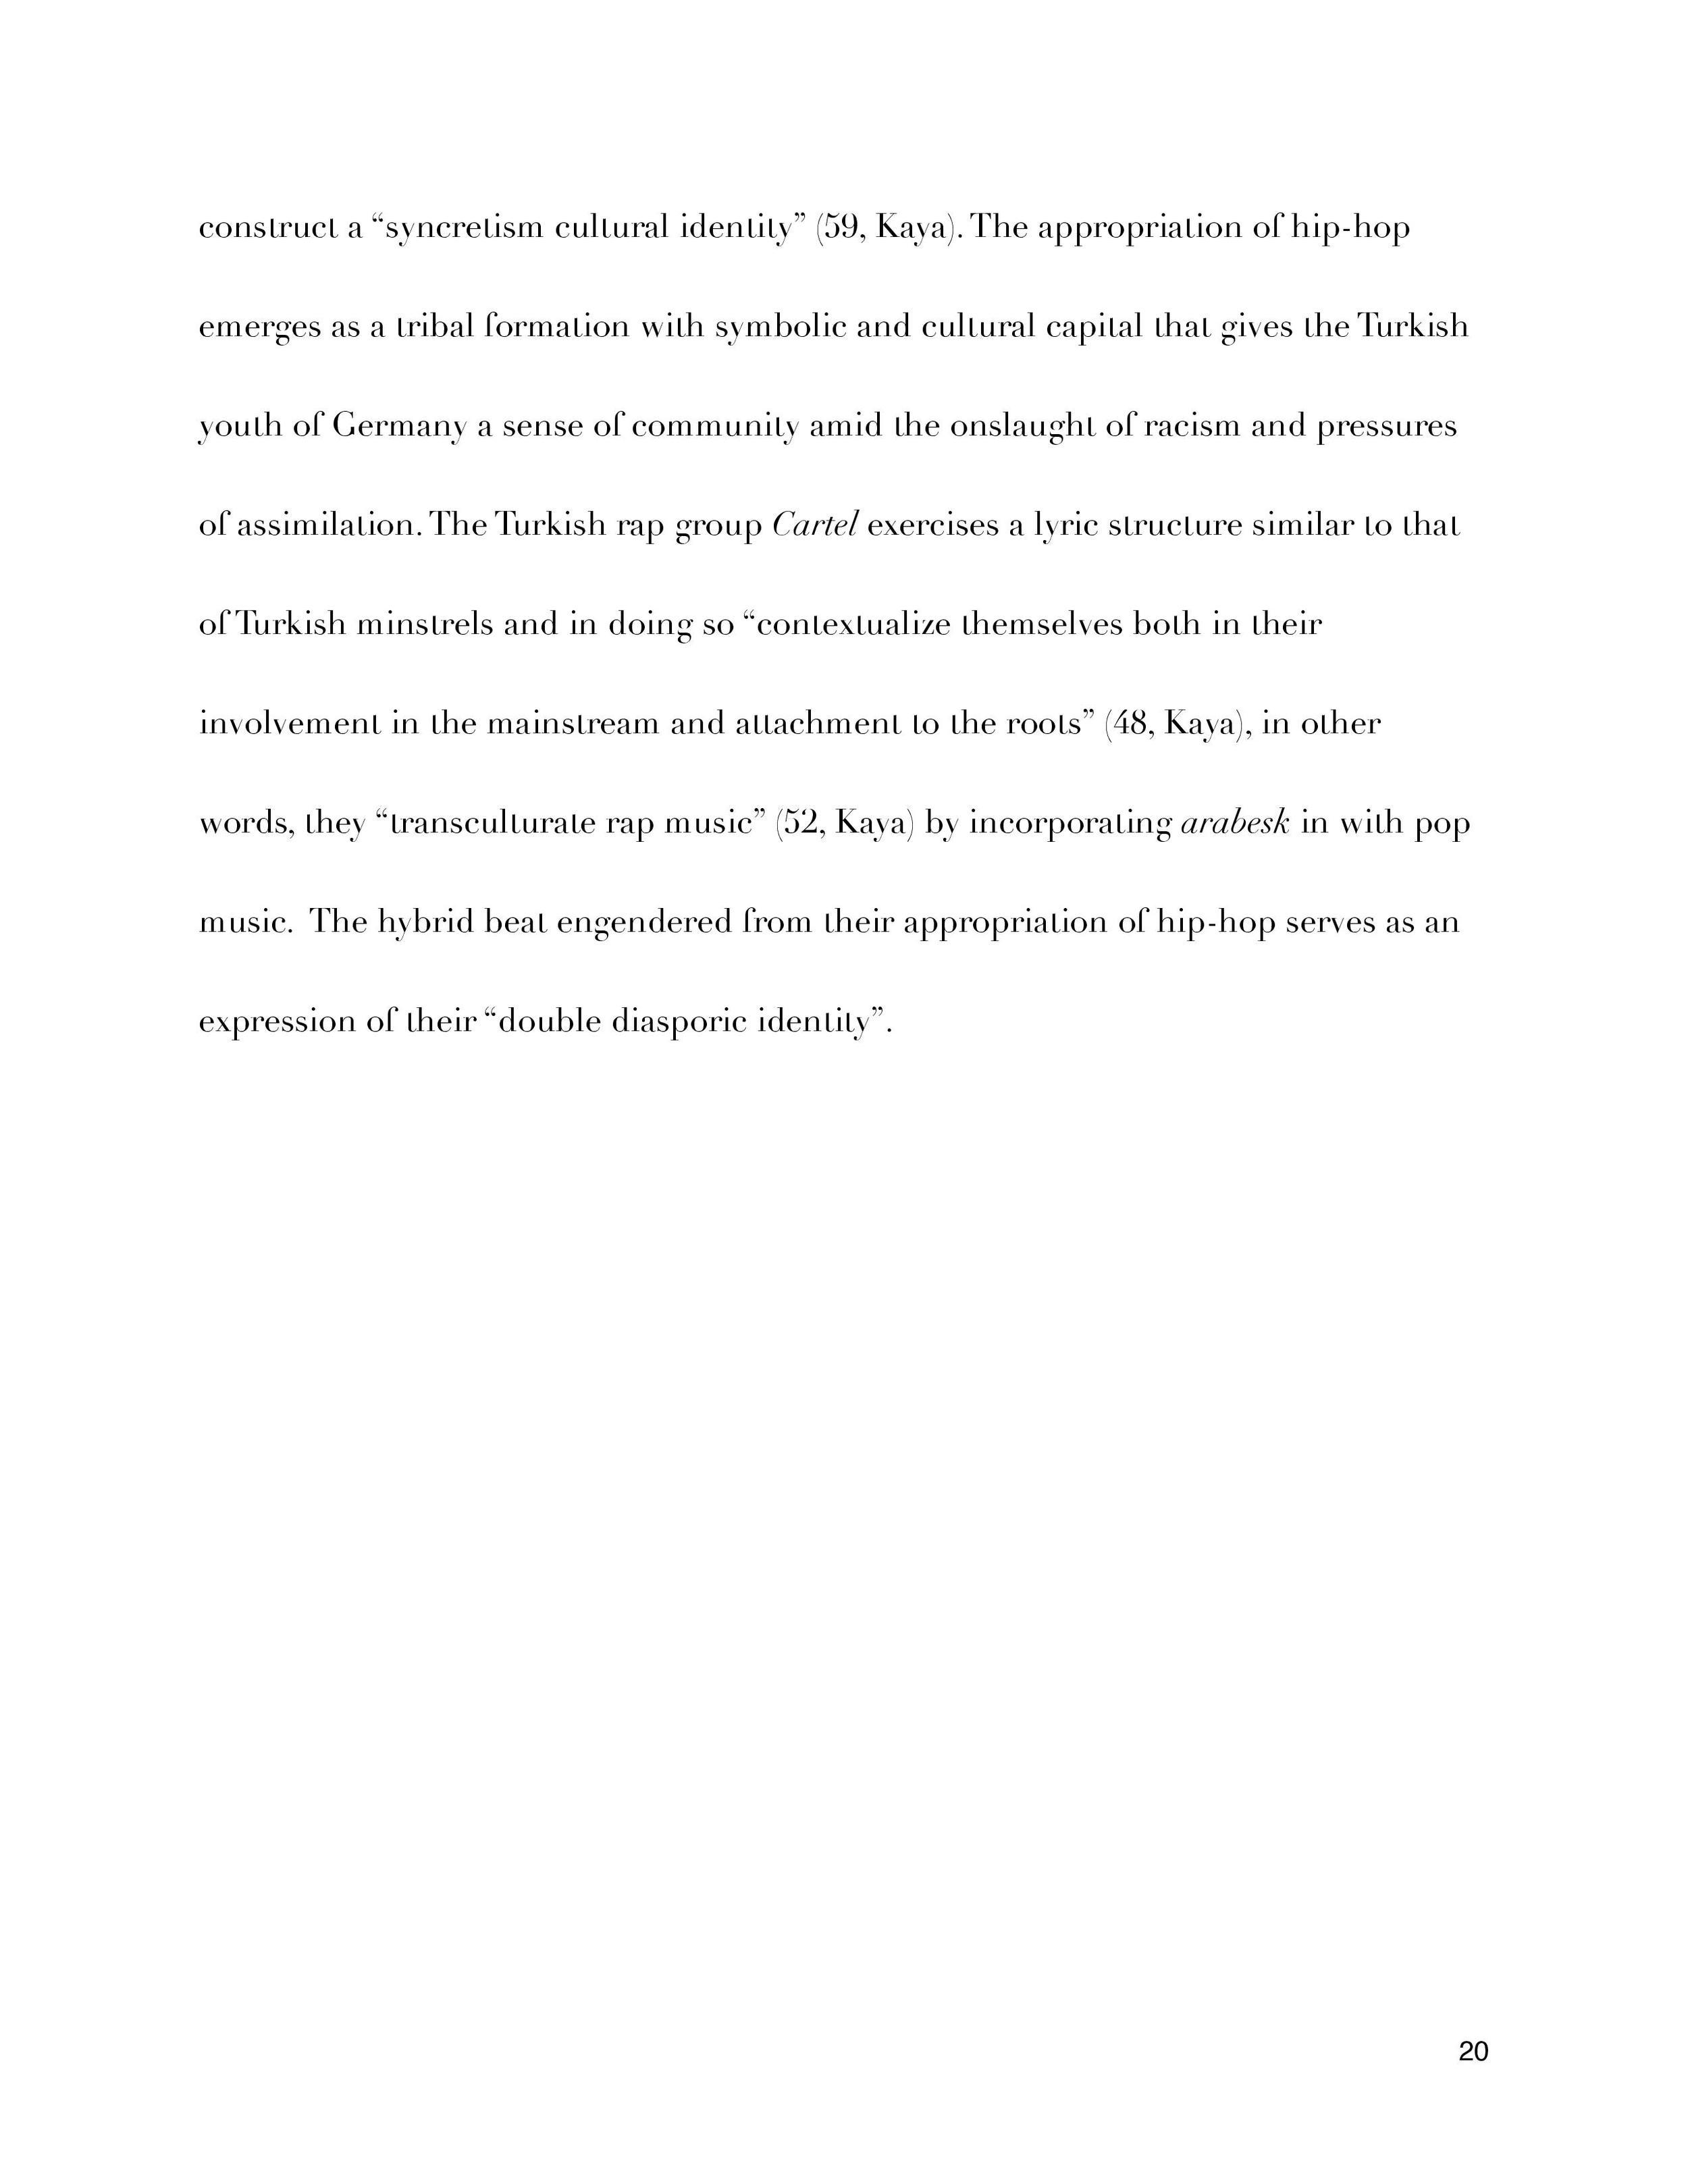 ShatteredGlass-page-021.jpg